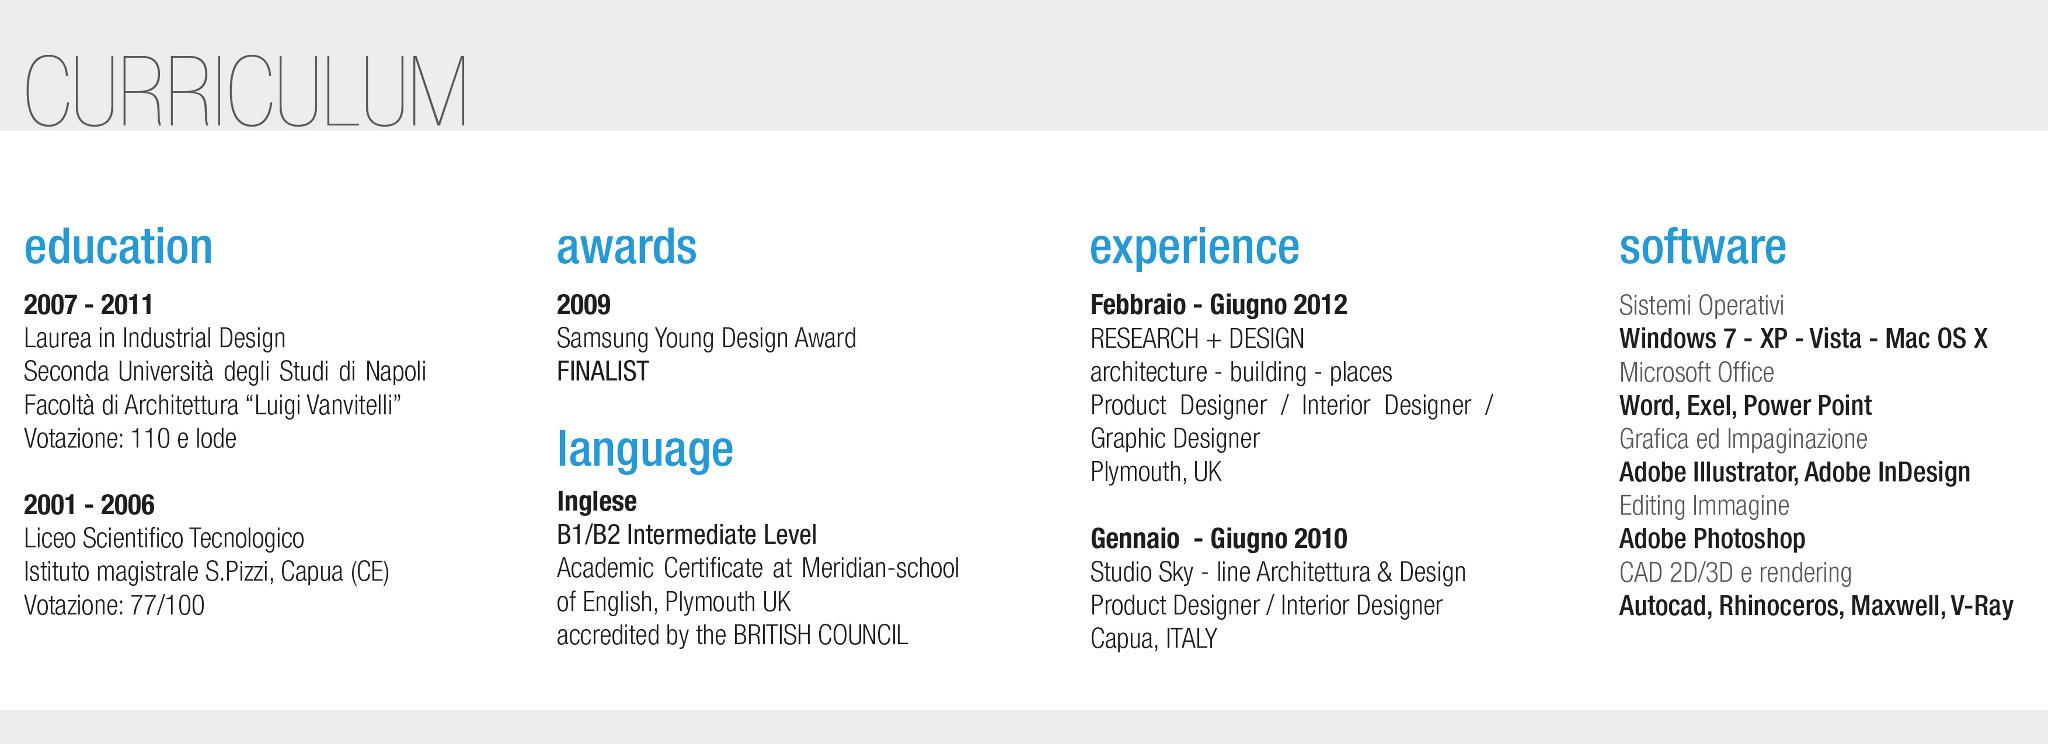 Studio Di Architettura In Inglese about me - ottavio ottaviano portfolio